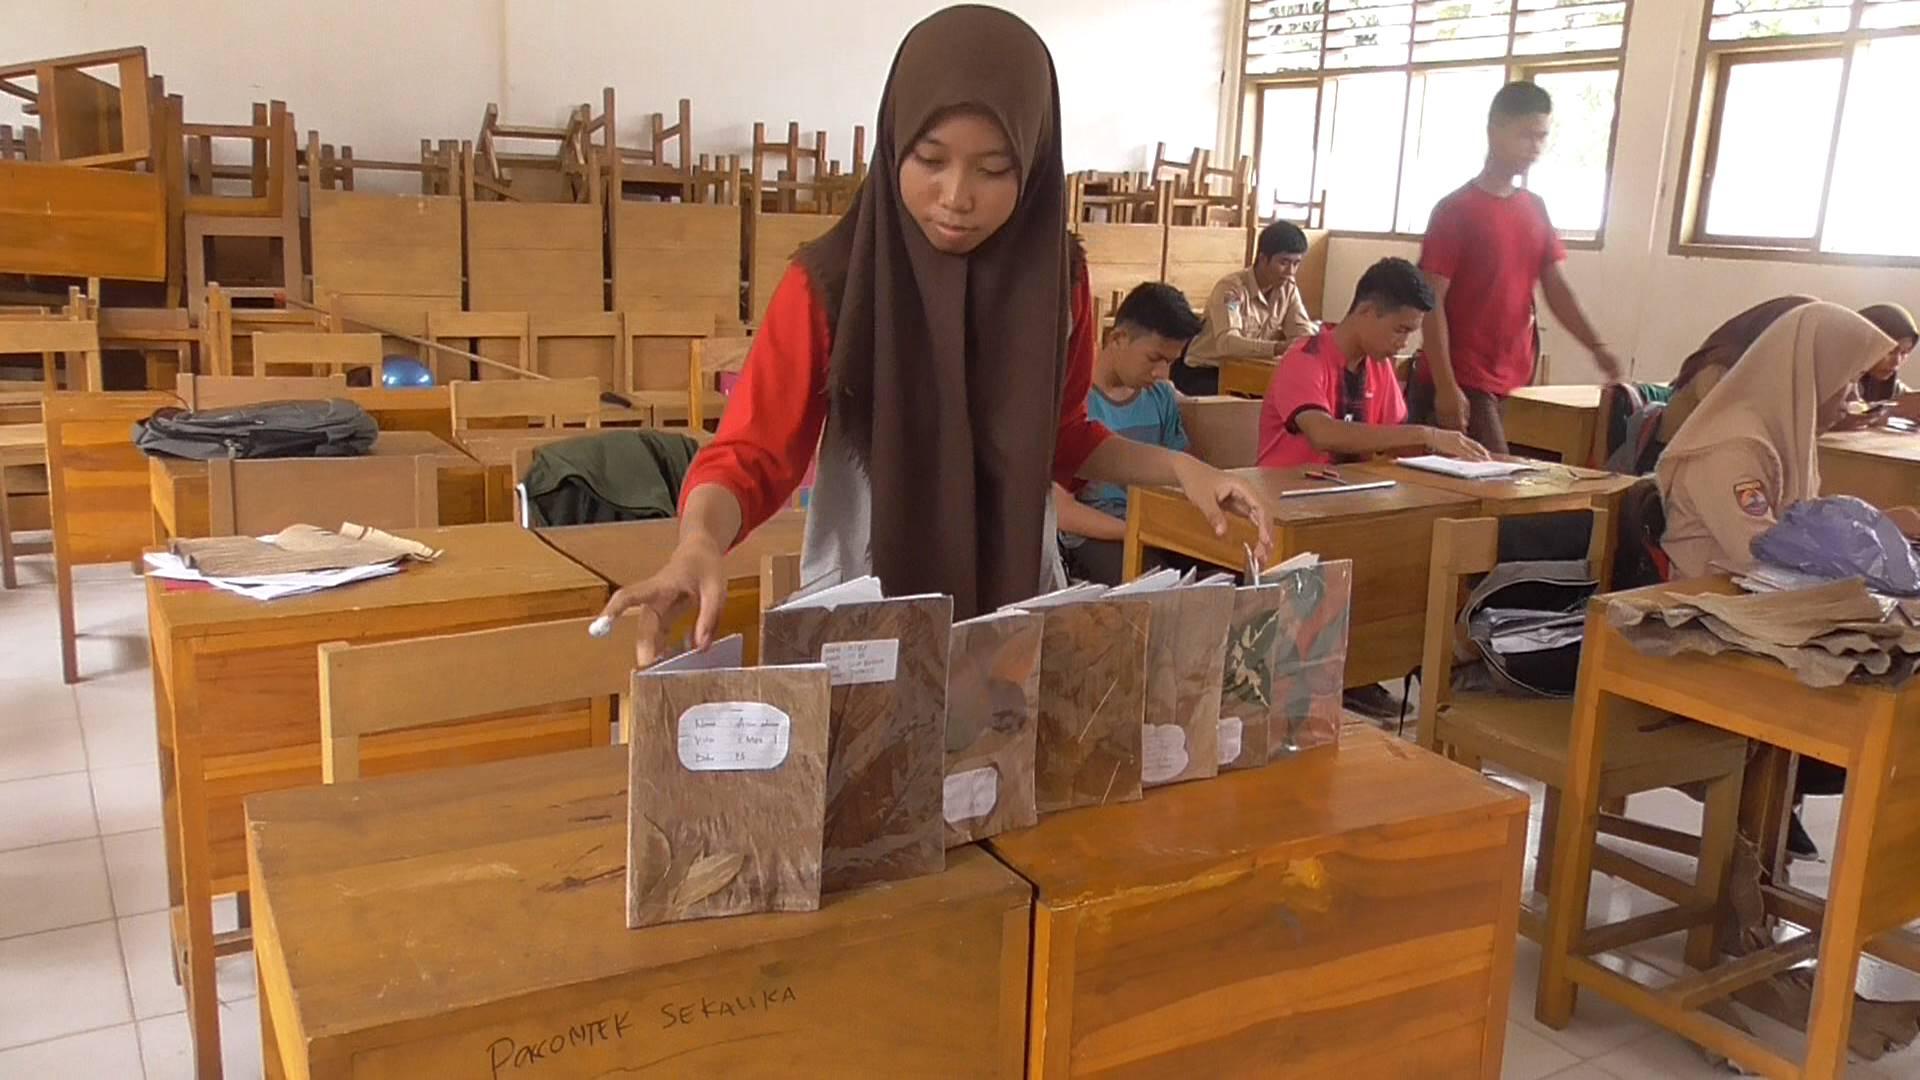 Kreatif, Siswa-Siswi SMA Tapango Sulap Daun Kering Jadi Pembungkus Buku